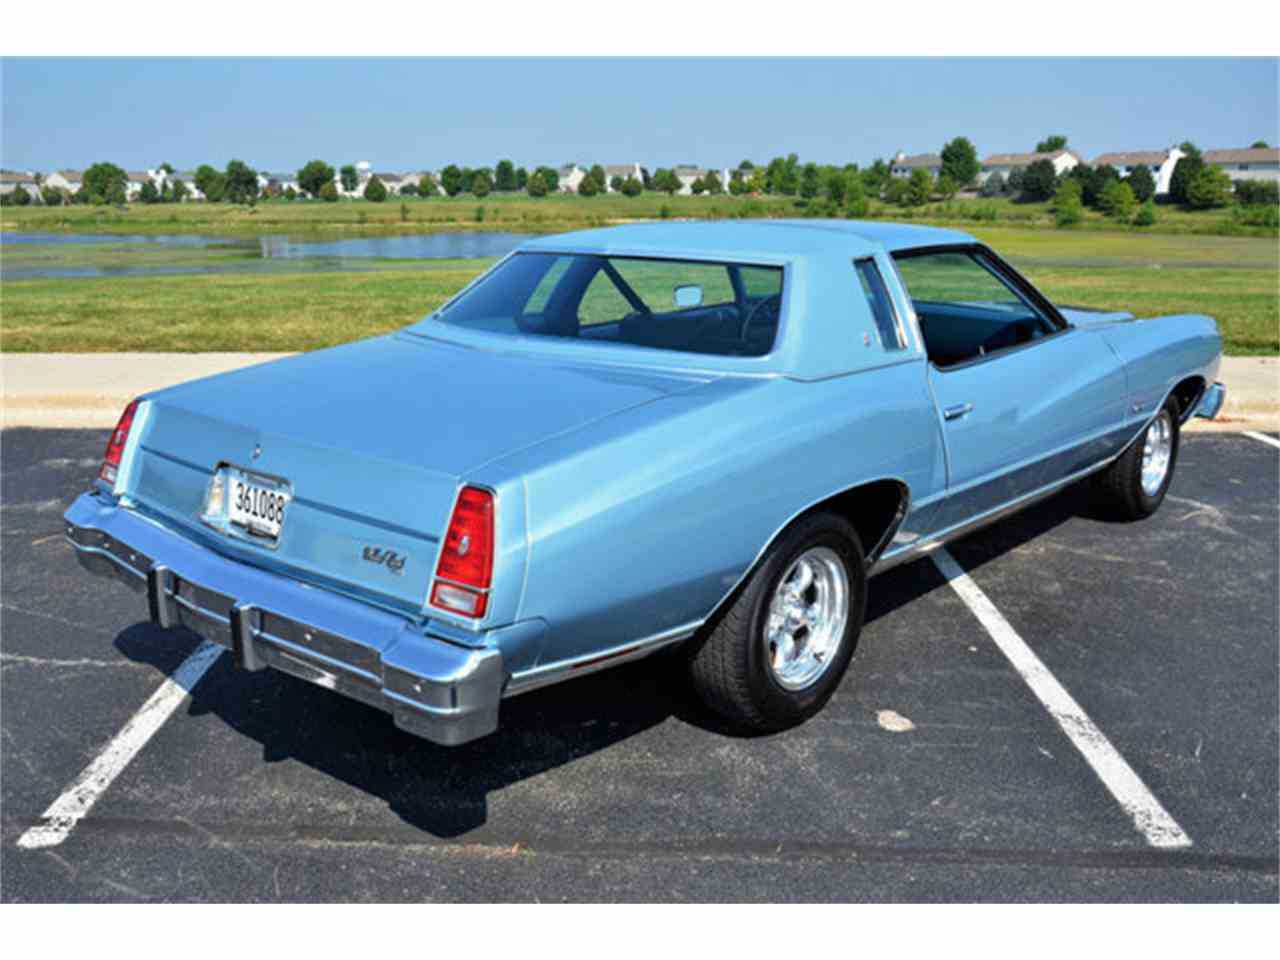 1976 Chevrolet Monte Carlo For Sale In Plainfield Il 1h57v6k459869 Chevy Prev